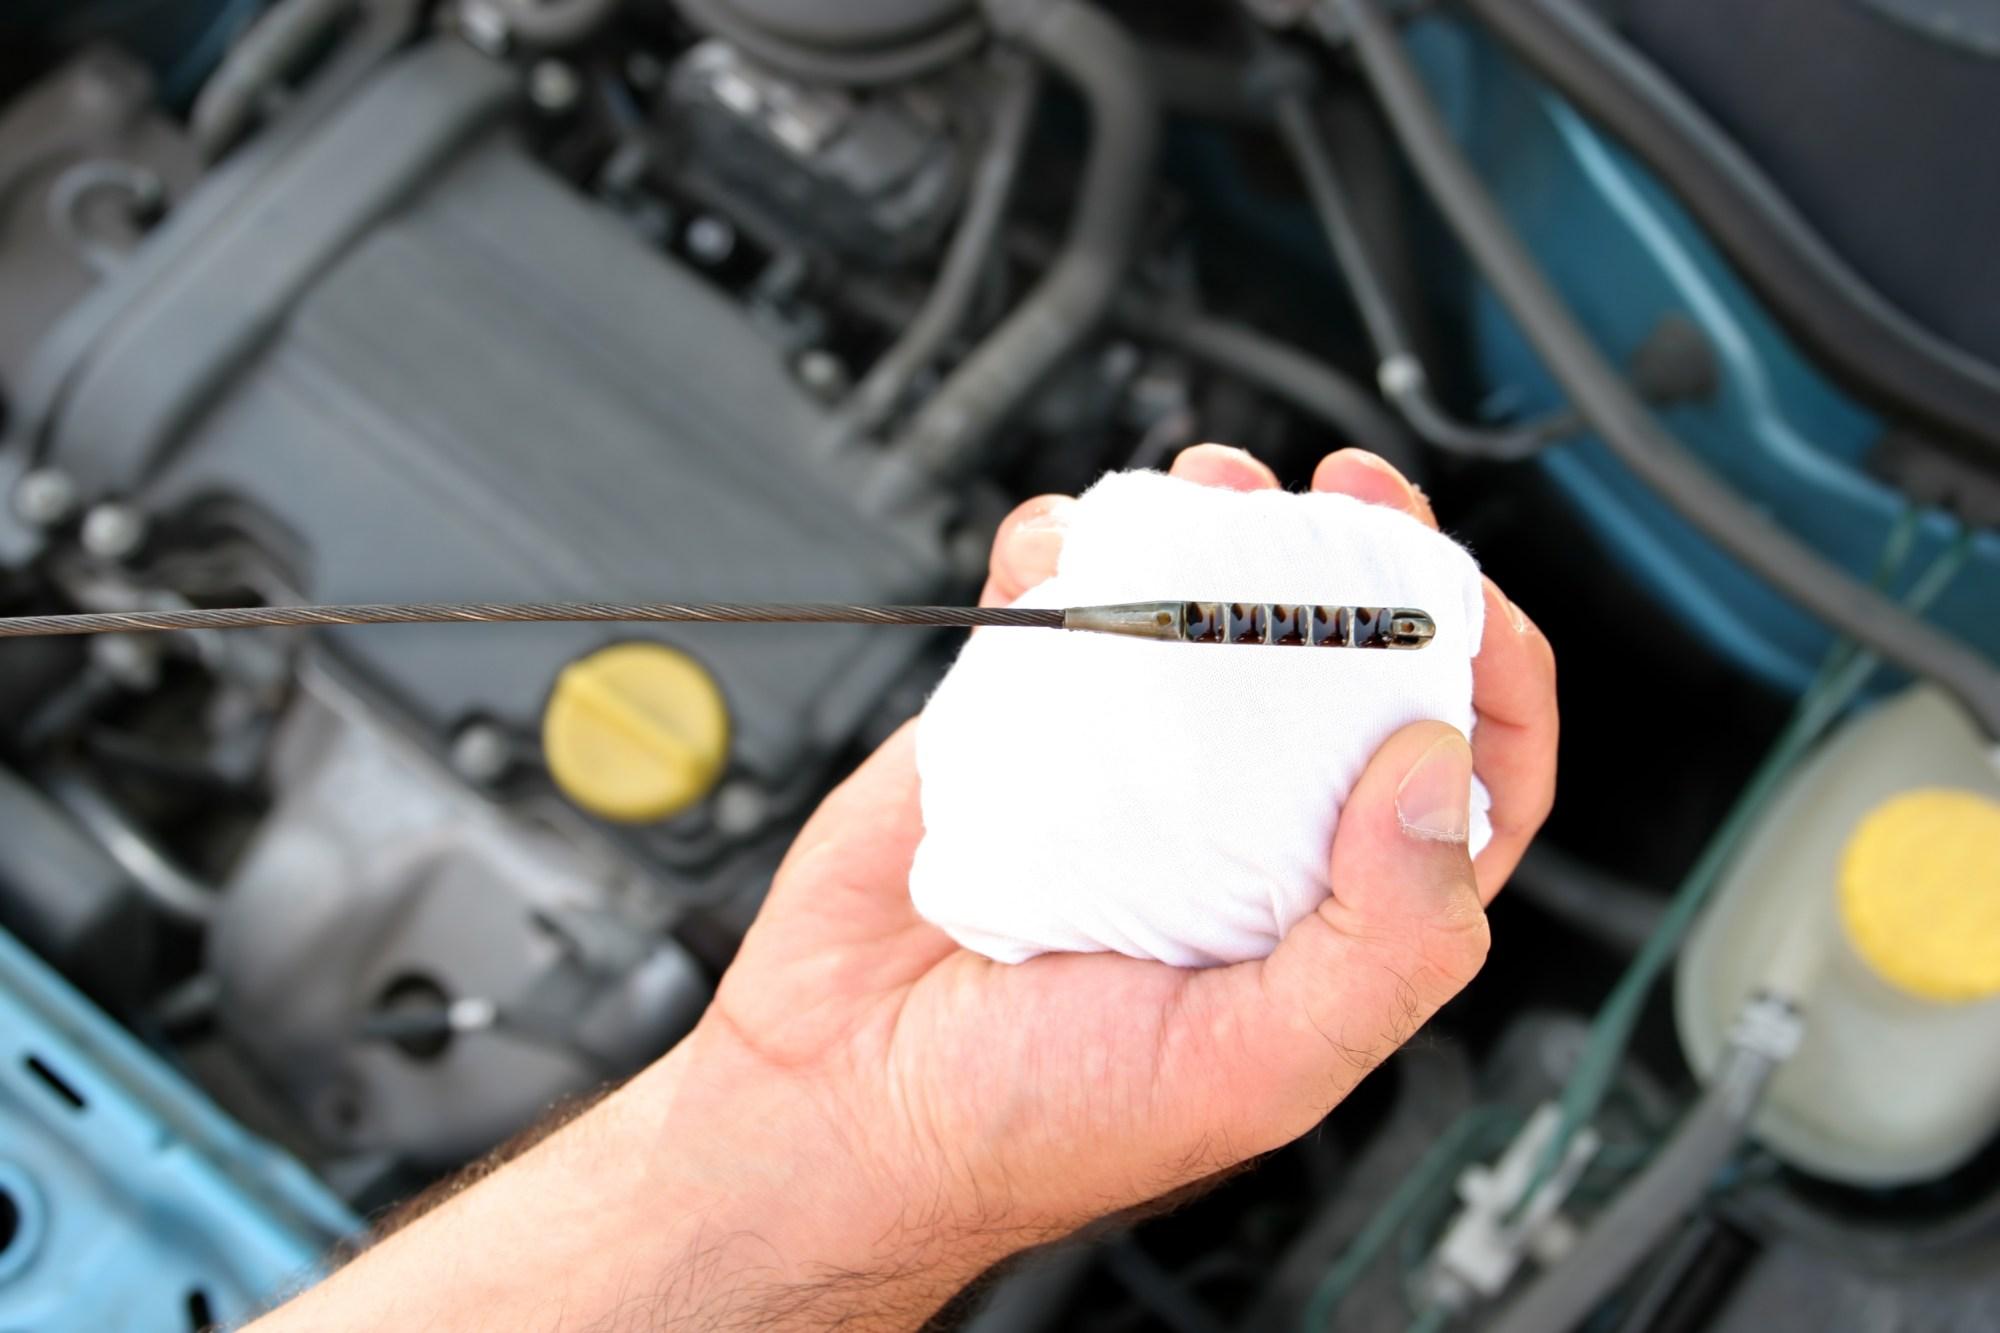 hight resolution of check car fluids